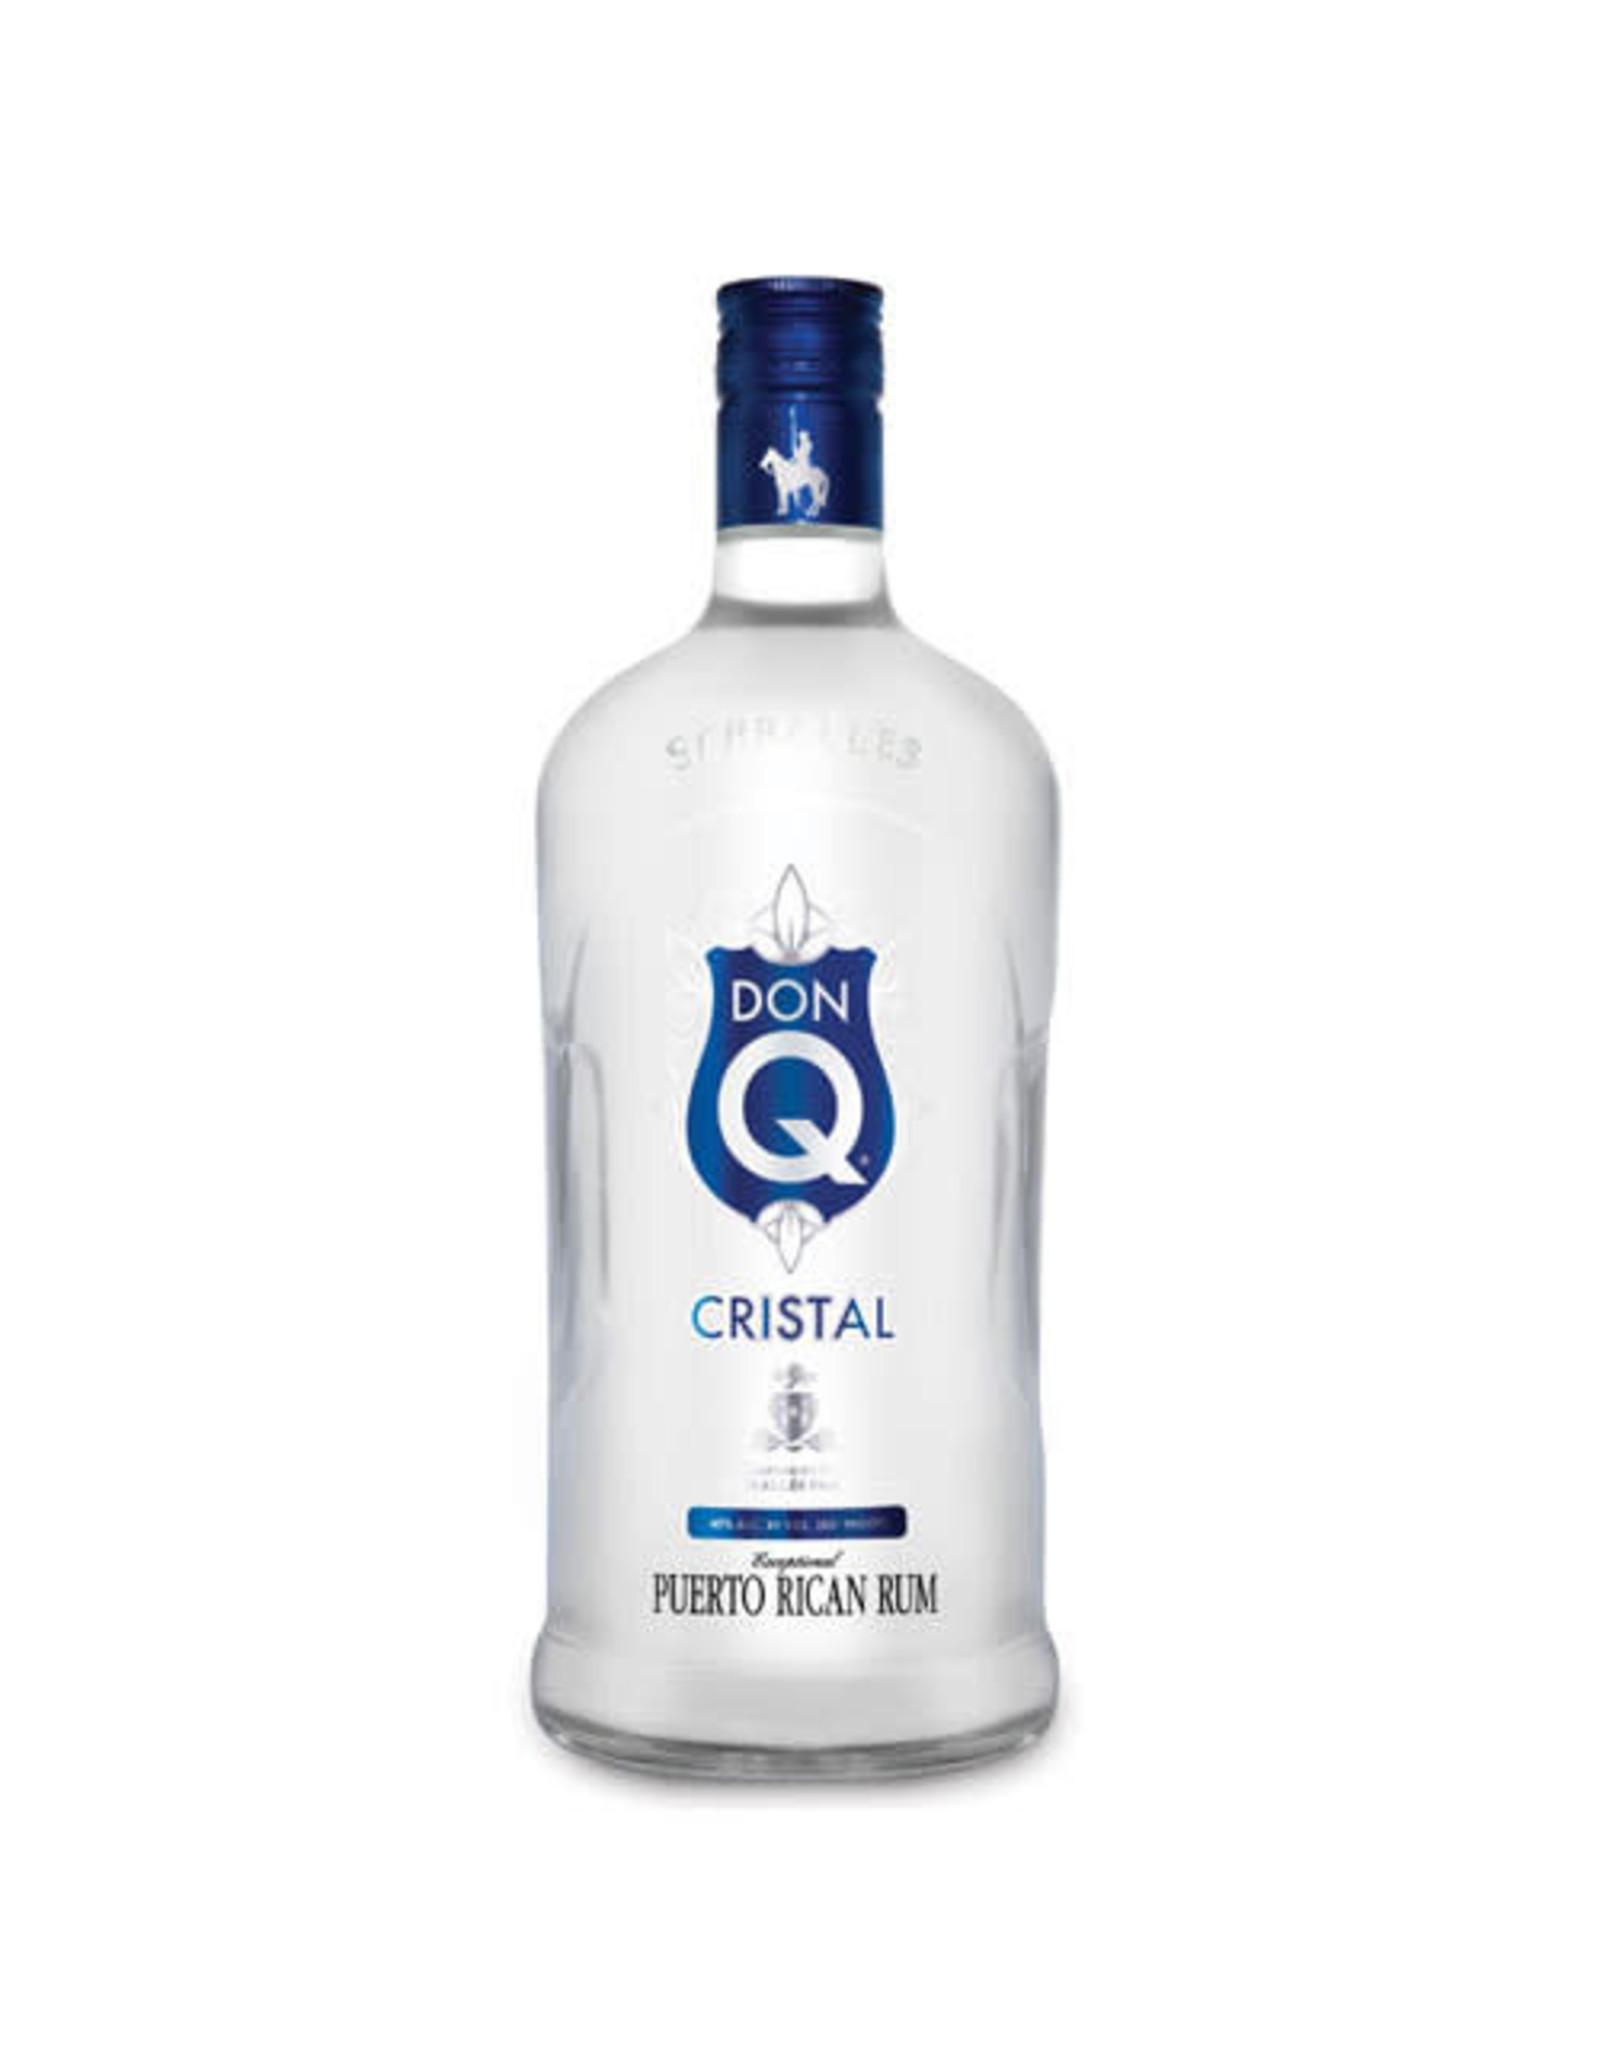 DON Q CRISTAL 1.75L